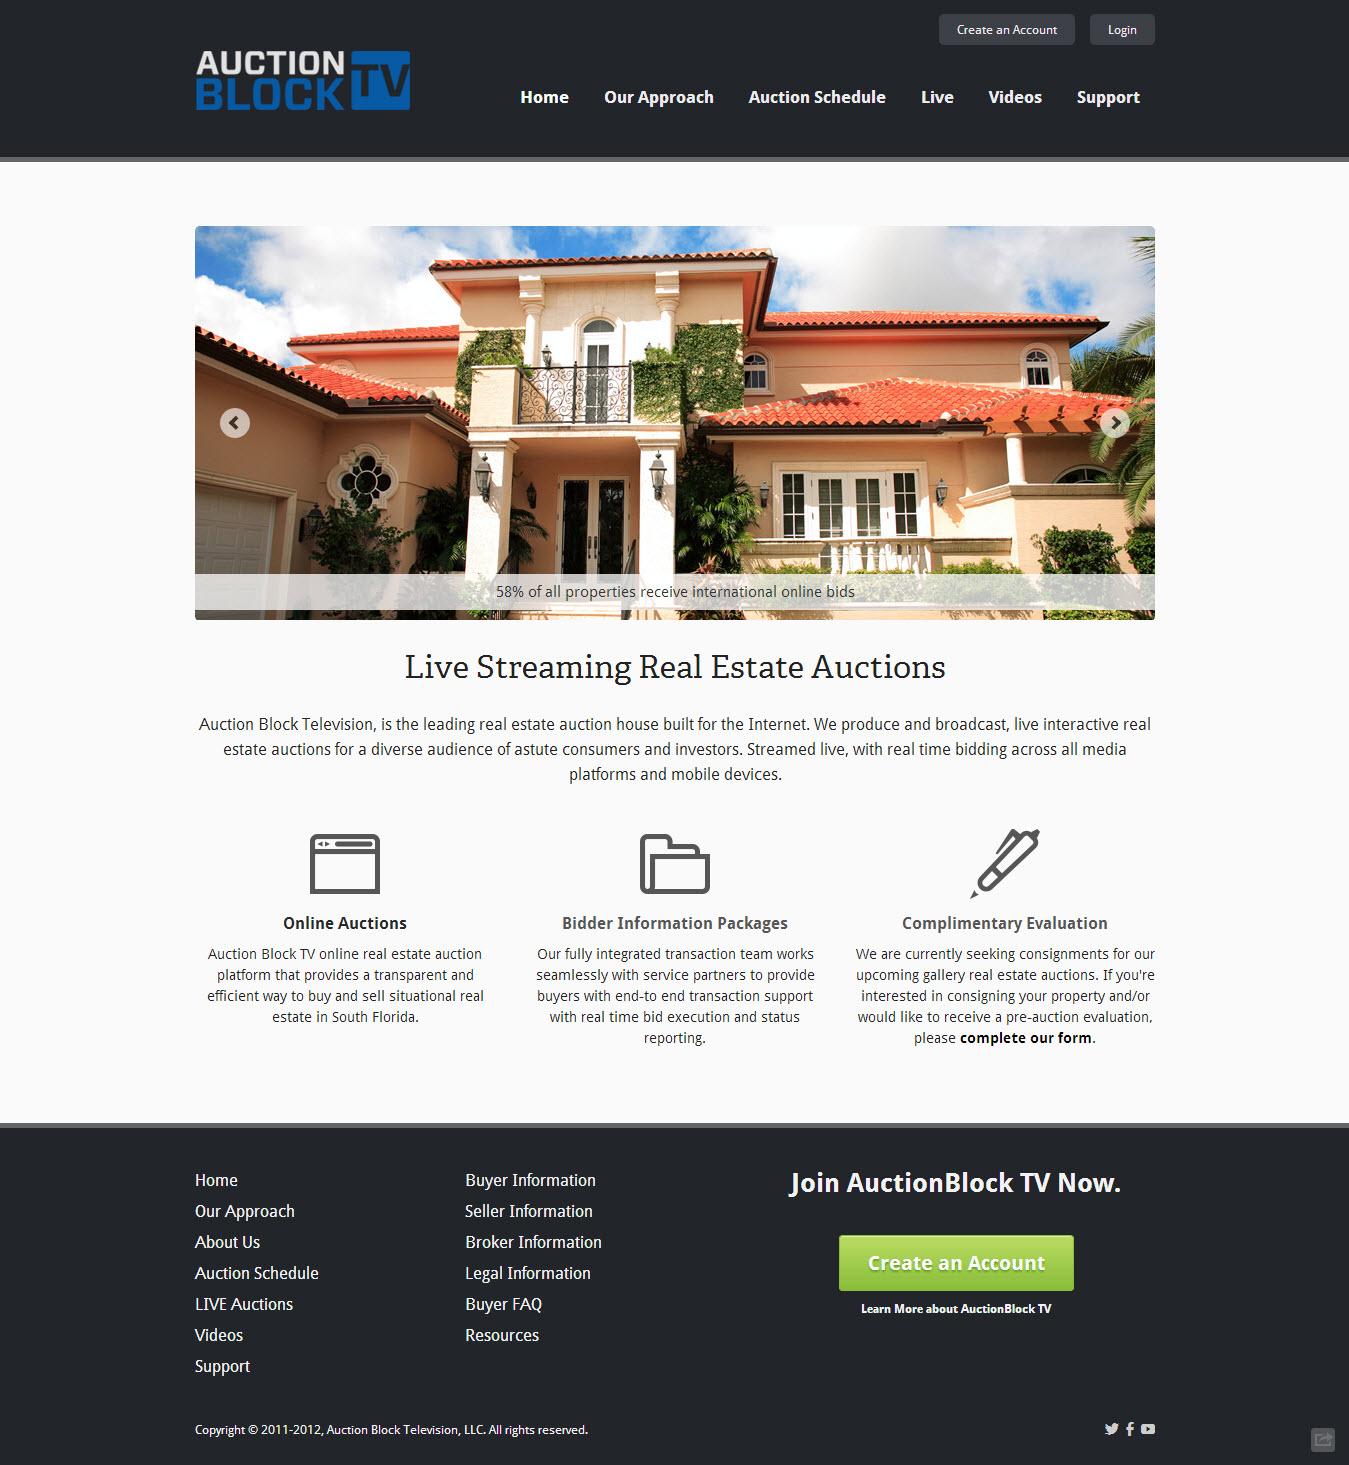 auction-block-tv.jpg